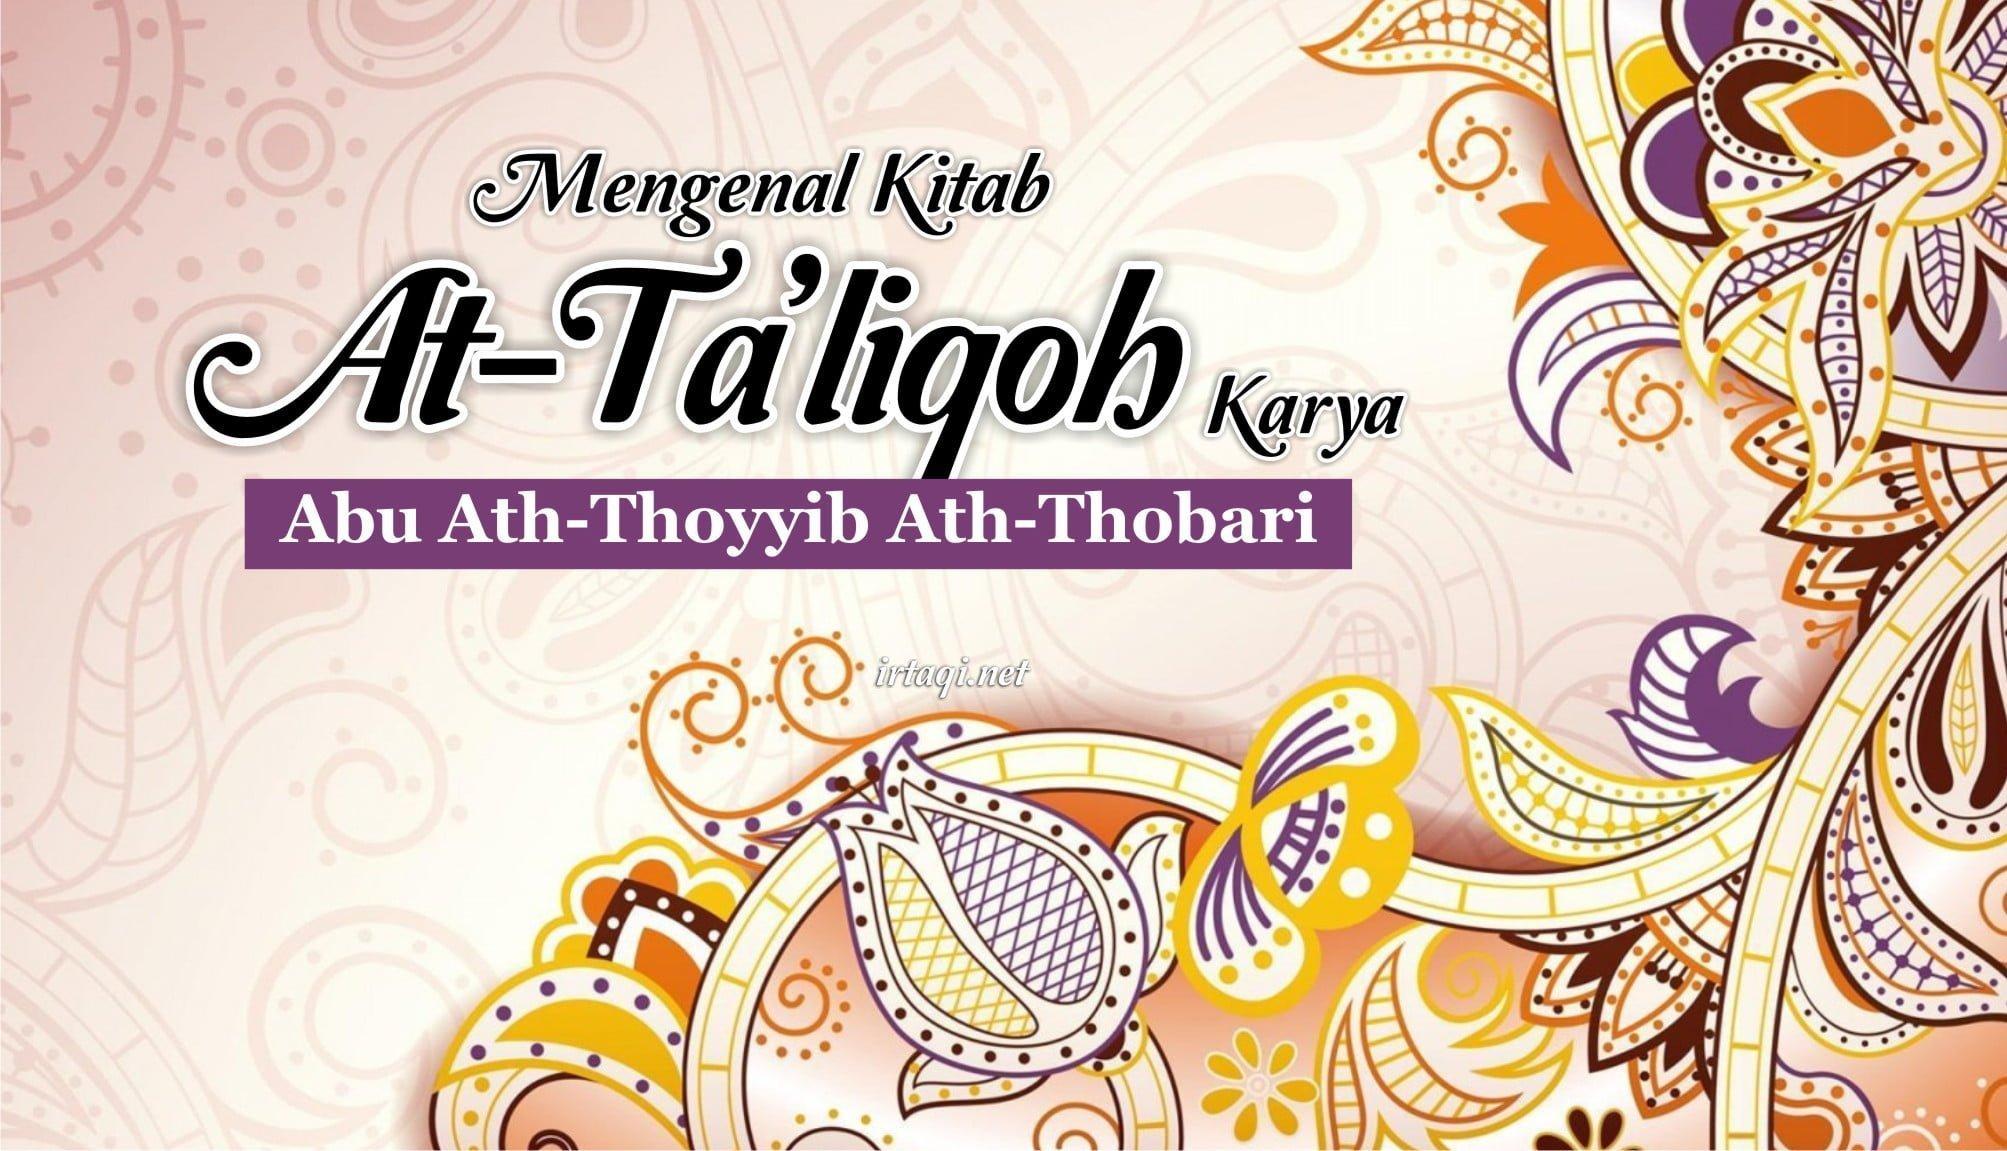 MENGENAL KITAB AT-TA'LIQOH KARYA ABU ATH-THOYYIB ATH-THOBARI